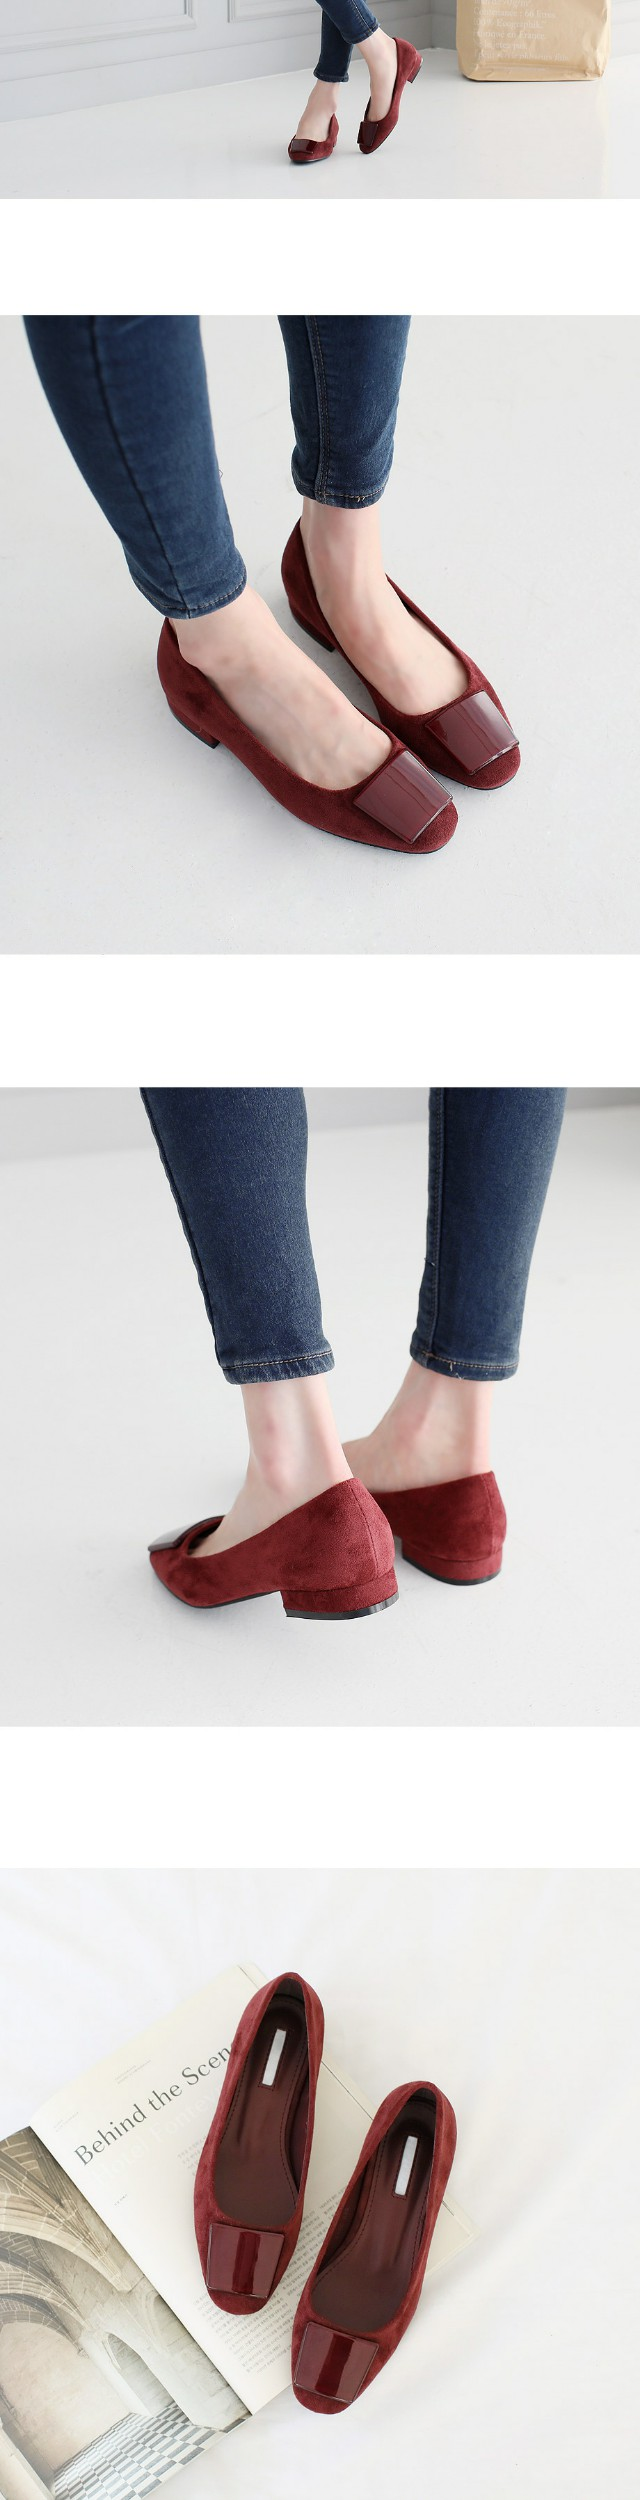 Forward Flat Shoes 2cm